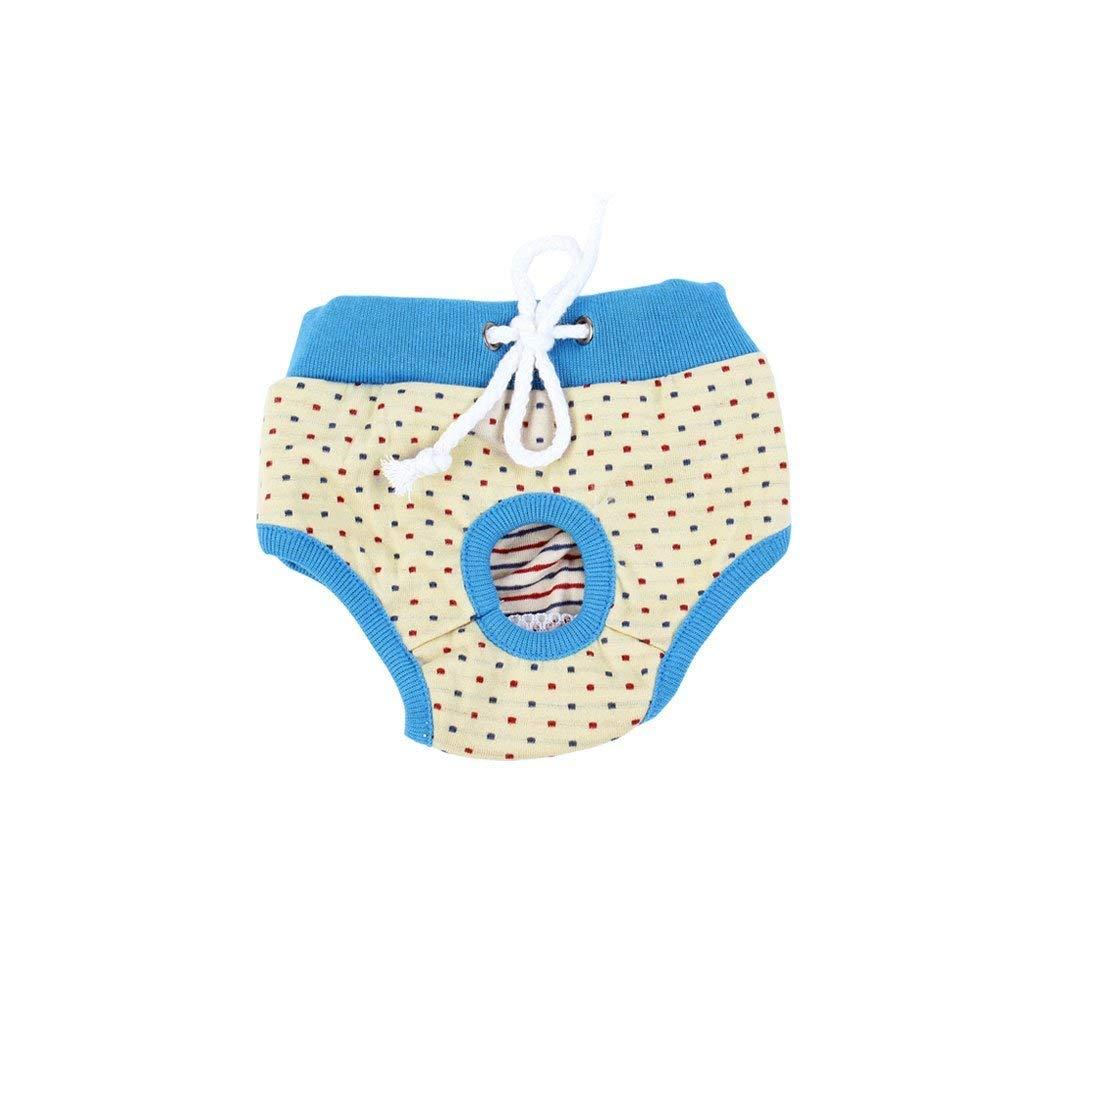 Uxcell Small Dots Pattern Adjustable Dog Waist Diaper Pants Underwear, Medium, Beige/Blue